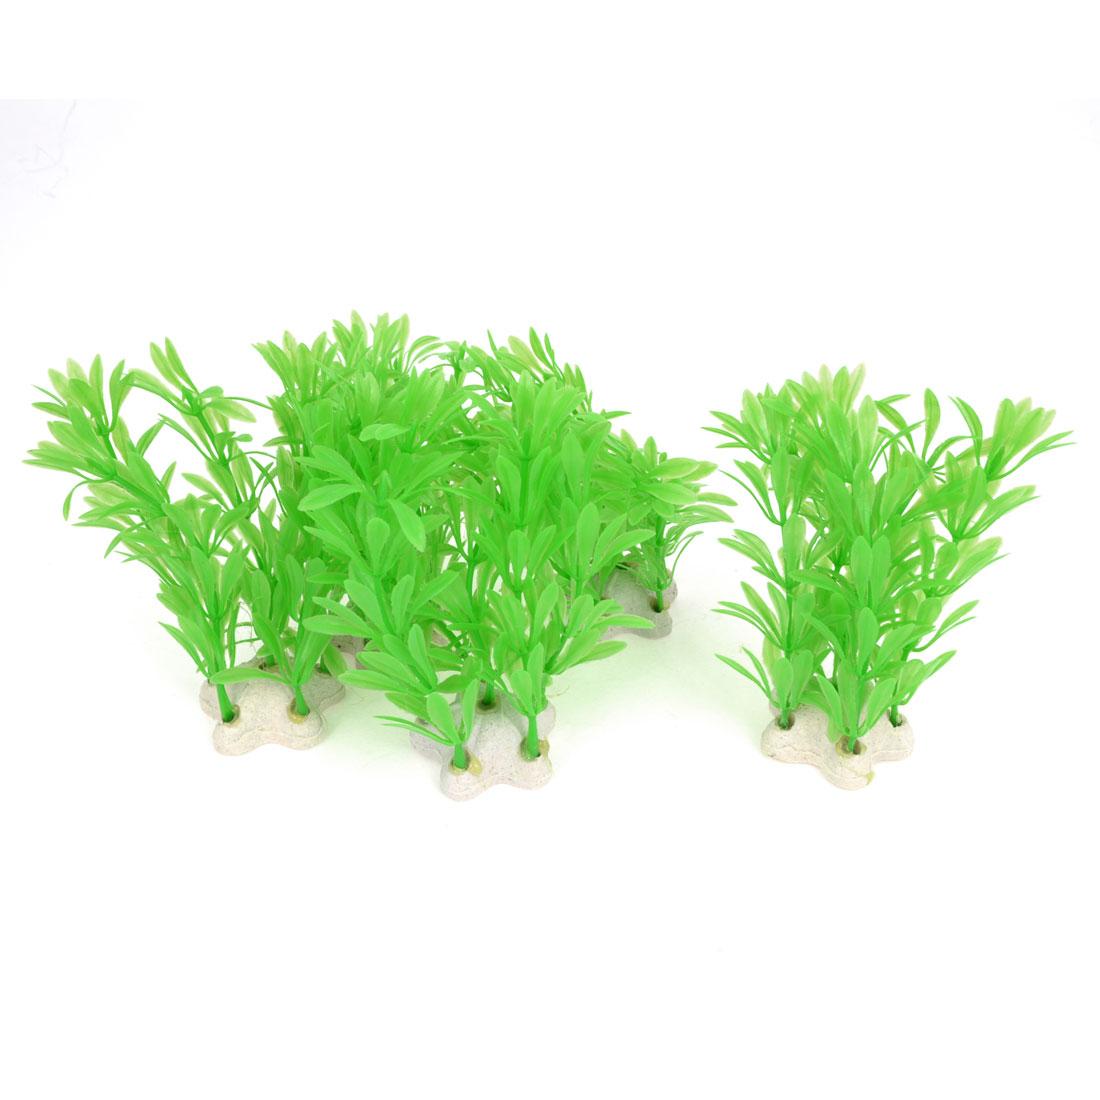 "Fish Tank Landscaping Star Shape Ceramic Base 4.7"" Height Aquatic Plant Grass Tree Green 5 Pcs"